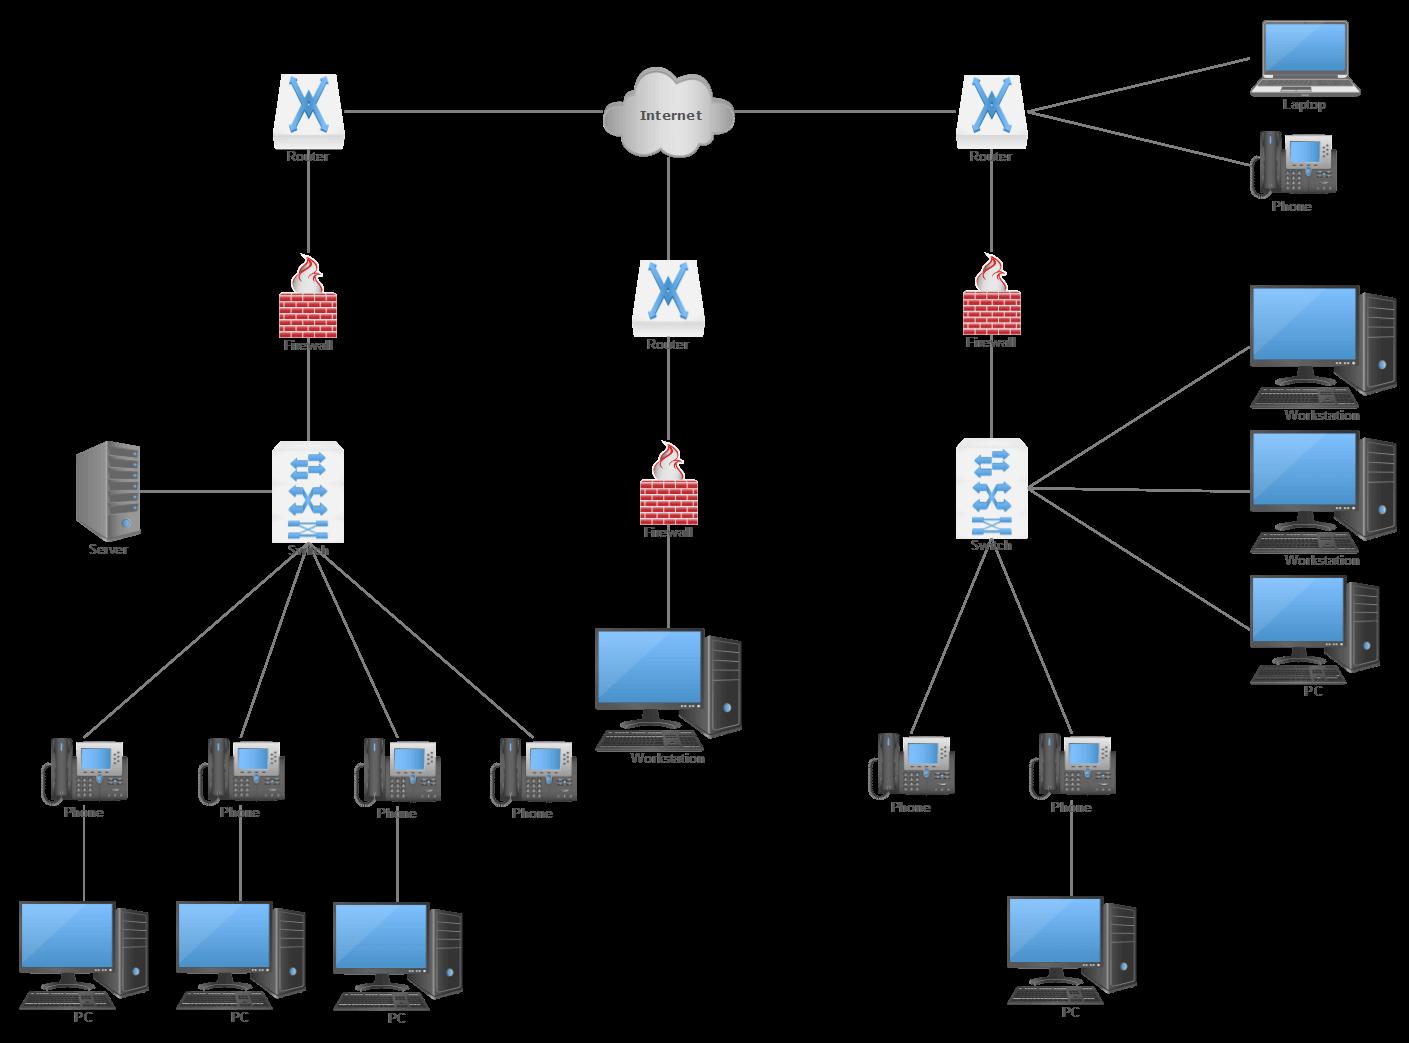 network diagram software free download or network diagram online rh smartdraw com draw a diagram online draw a diagram problems